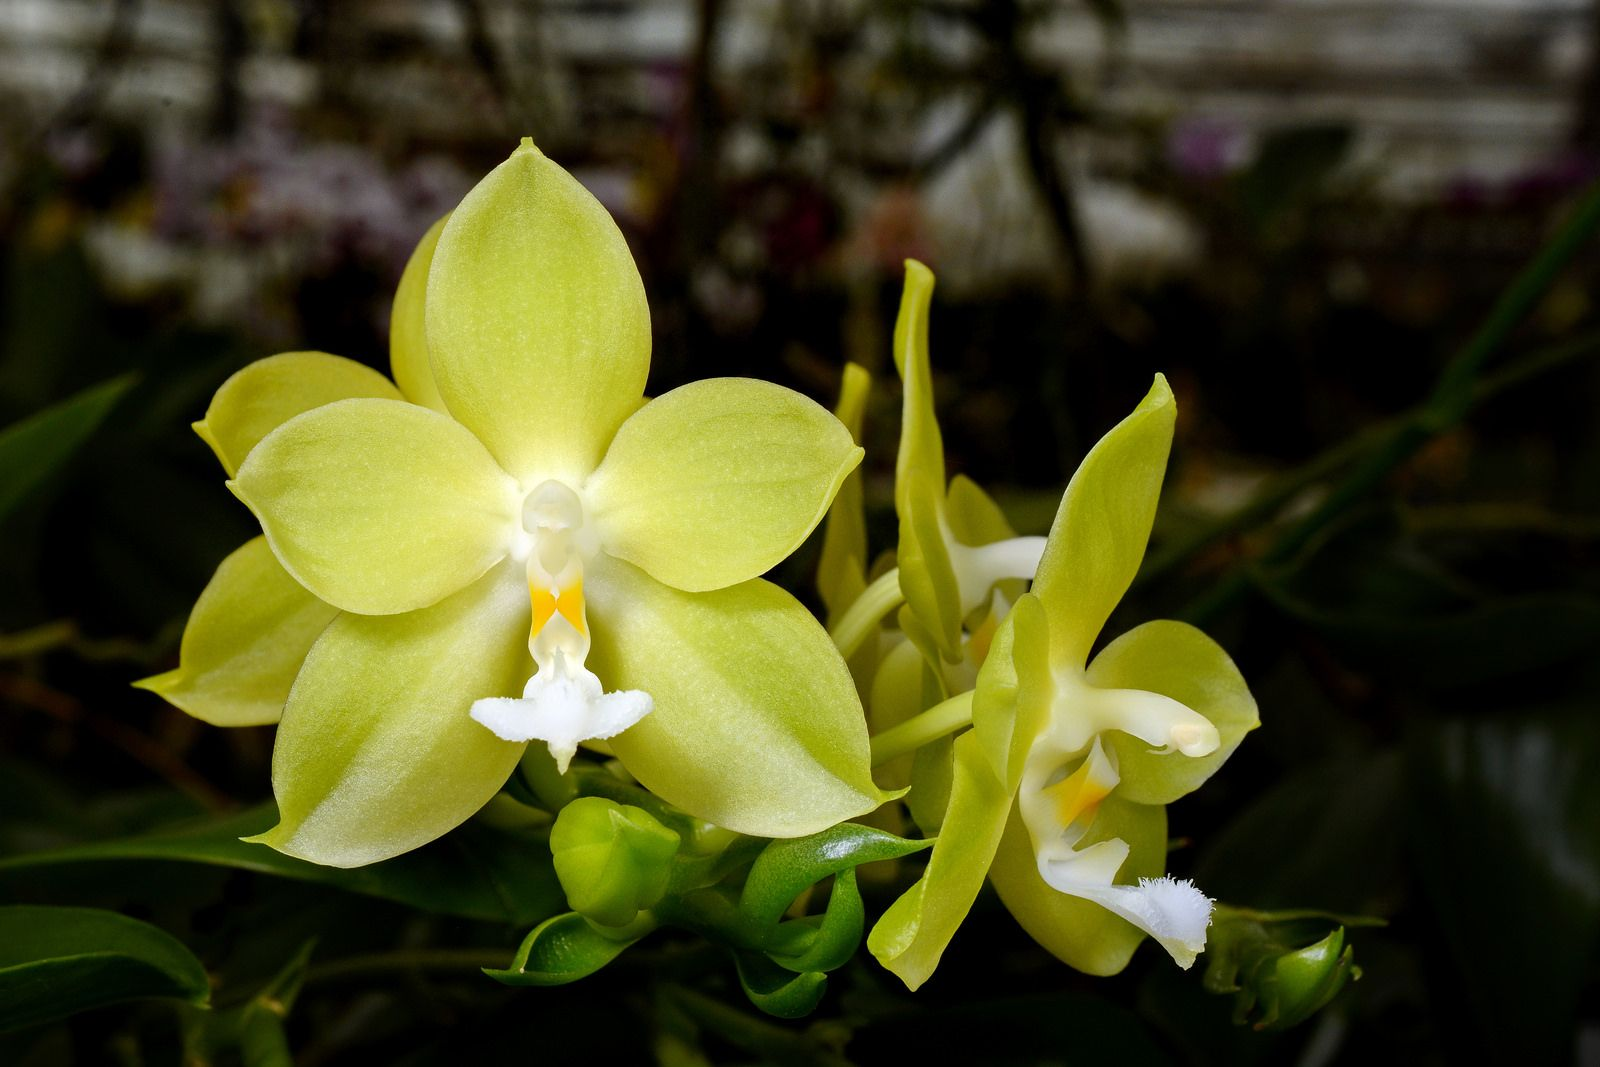 Phalaenopsis Joy Dreamy Jade Green Star Orchid Flower Orchid Photo Beautiful Flowers